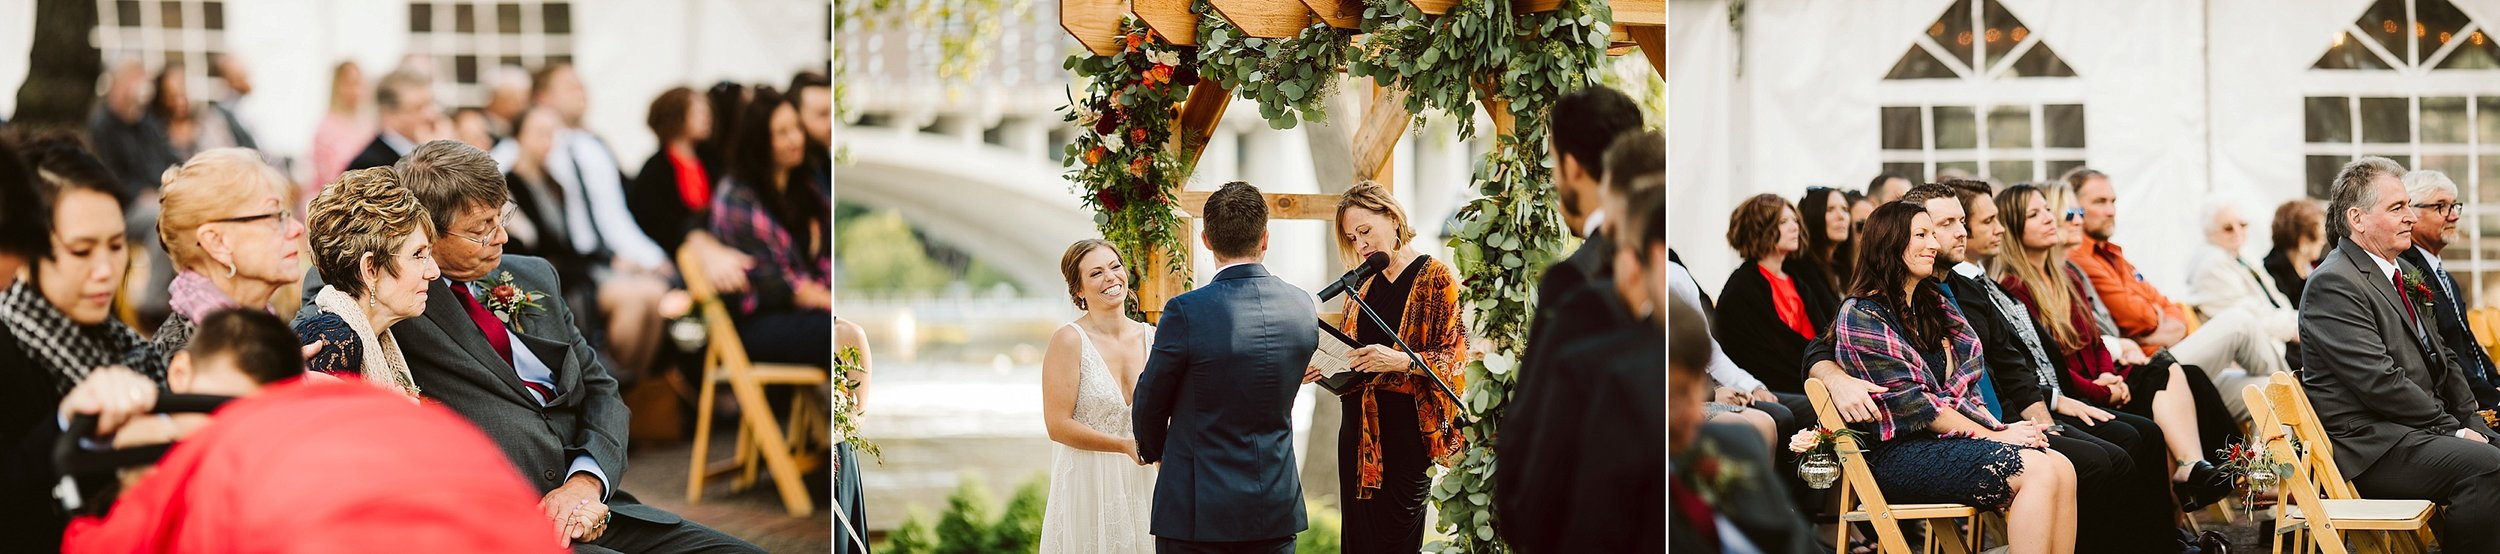 Nicollet-Island-Pavilion-Minneapolis-September-Coral-Navy-Wedding-108.jpg